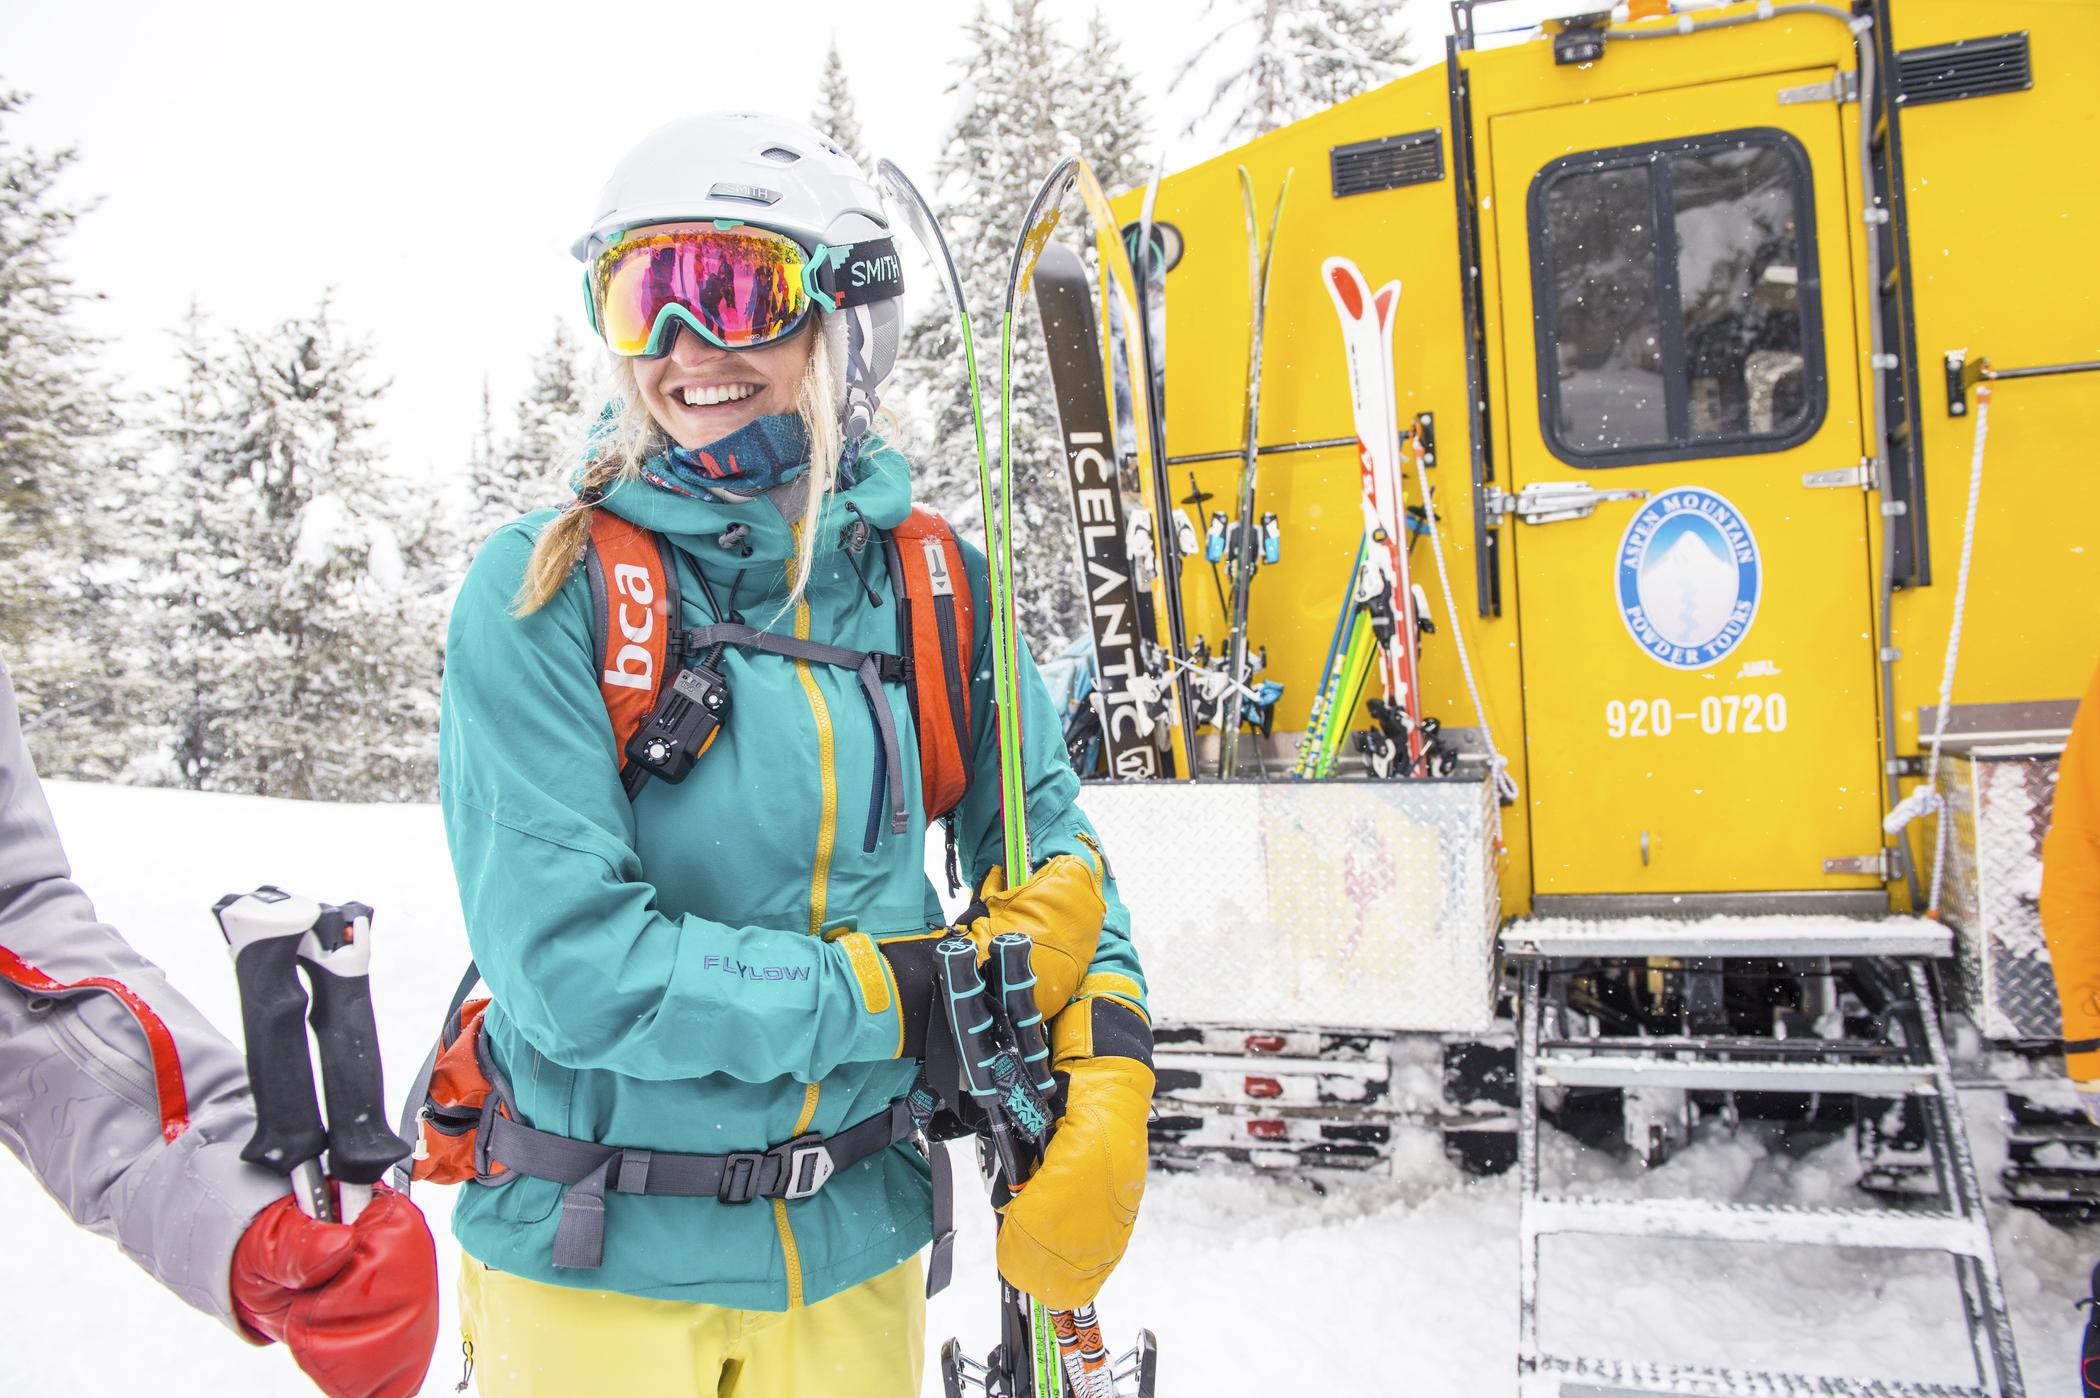 Skier in Aspen